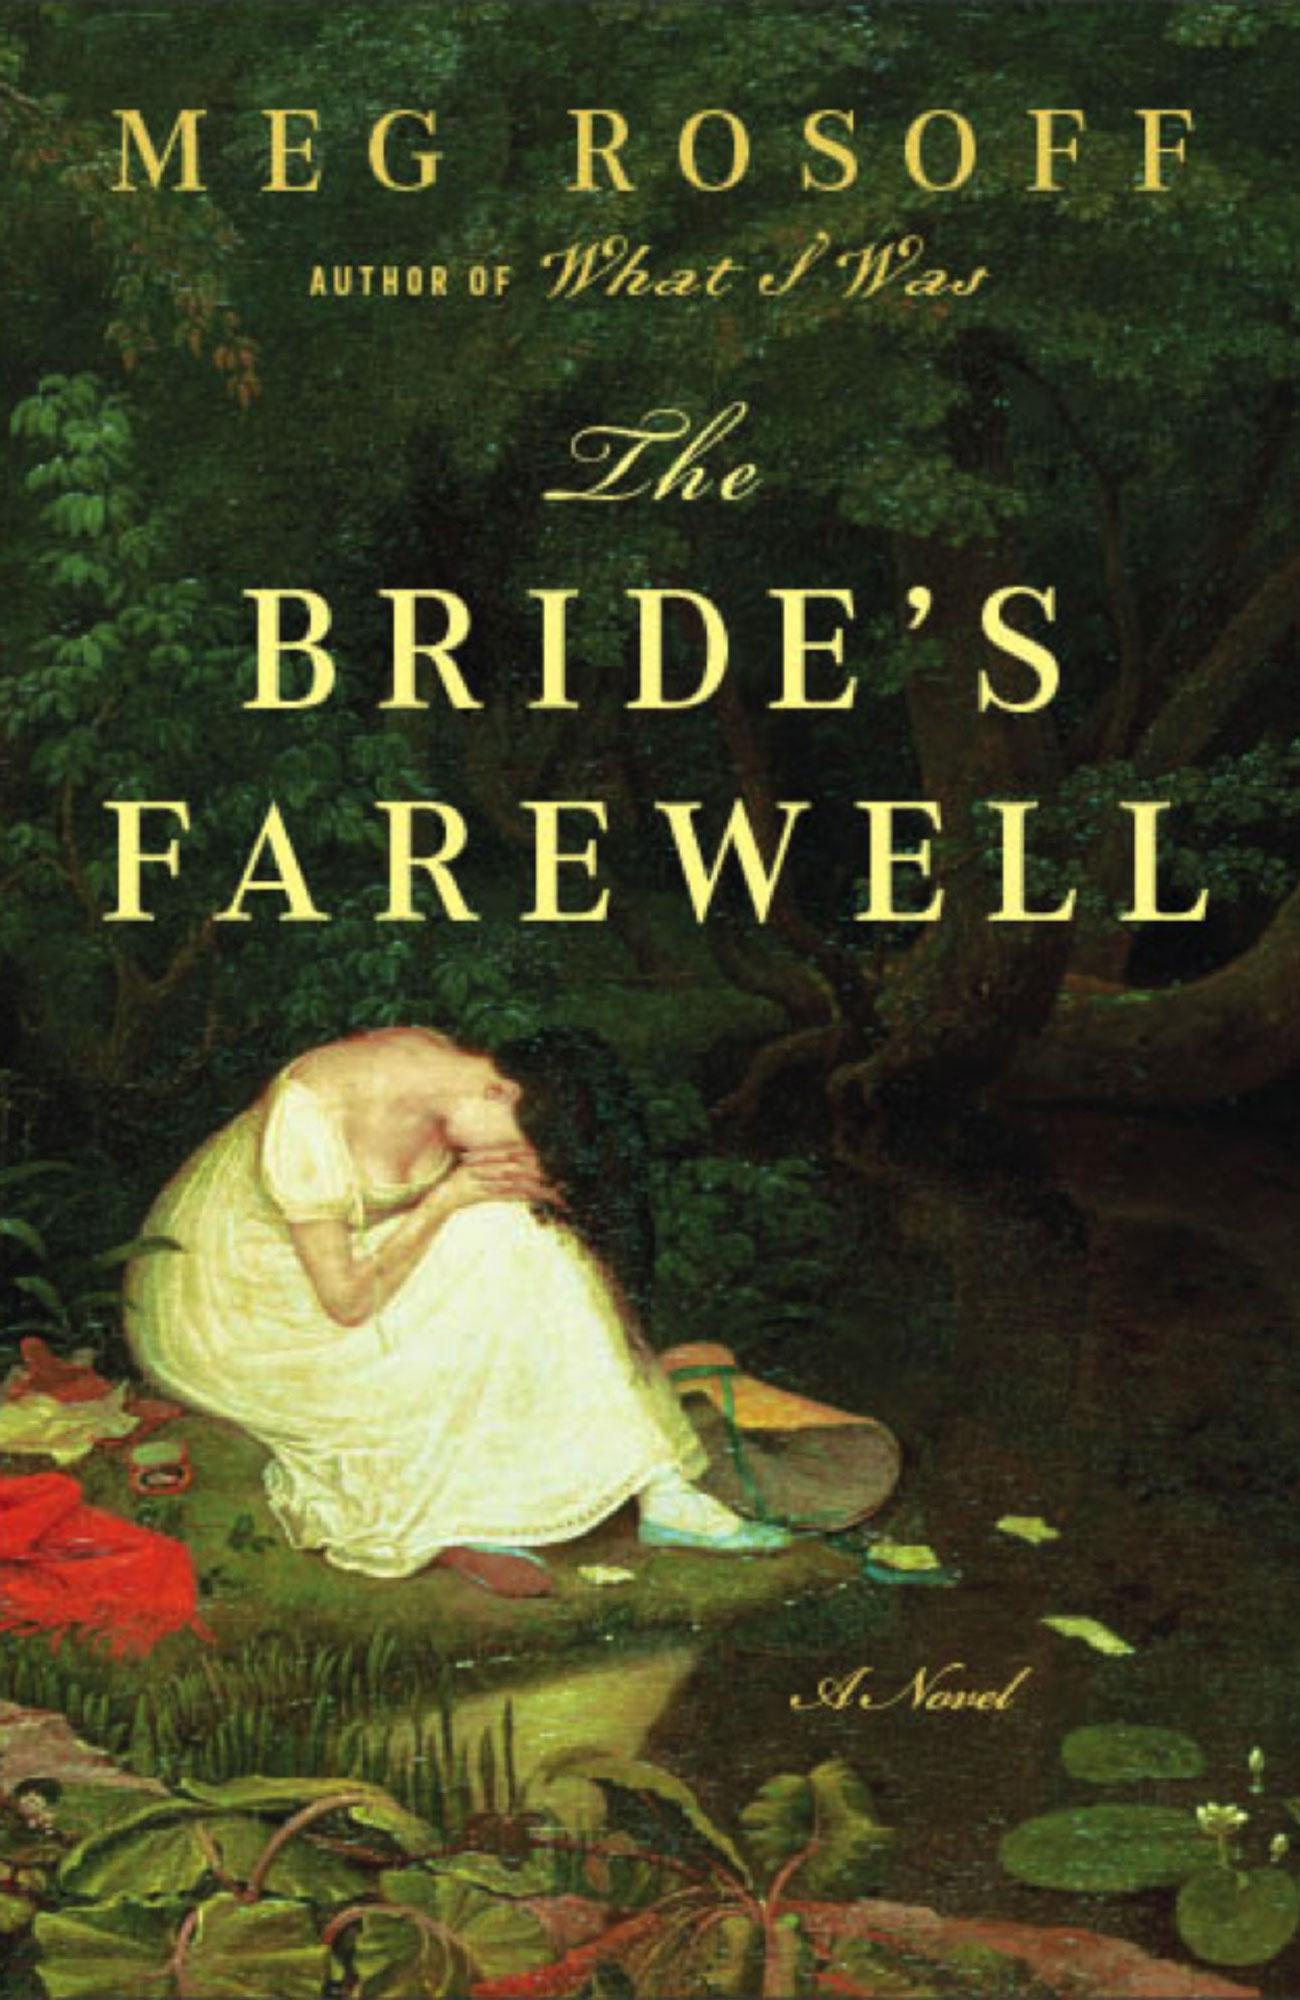 Meg-Rosoff---The-Brides-Farewell-6.jpg